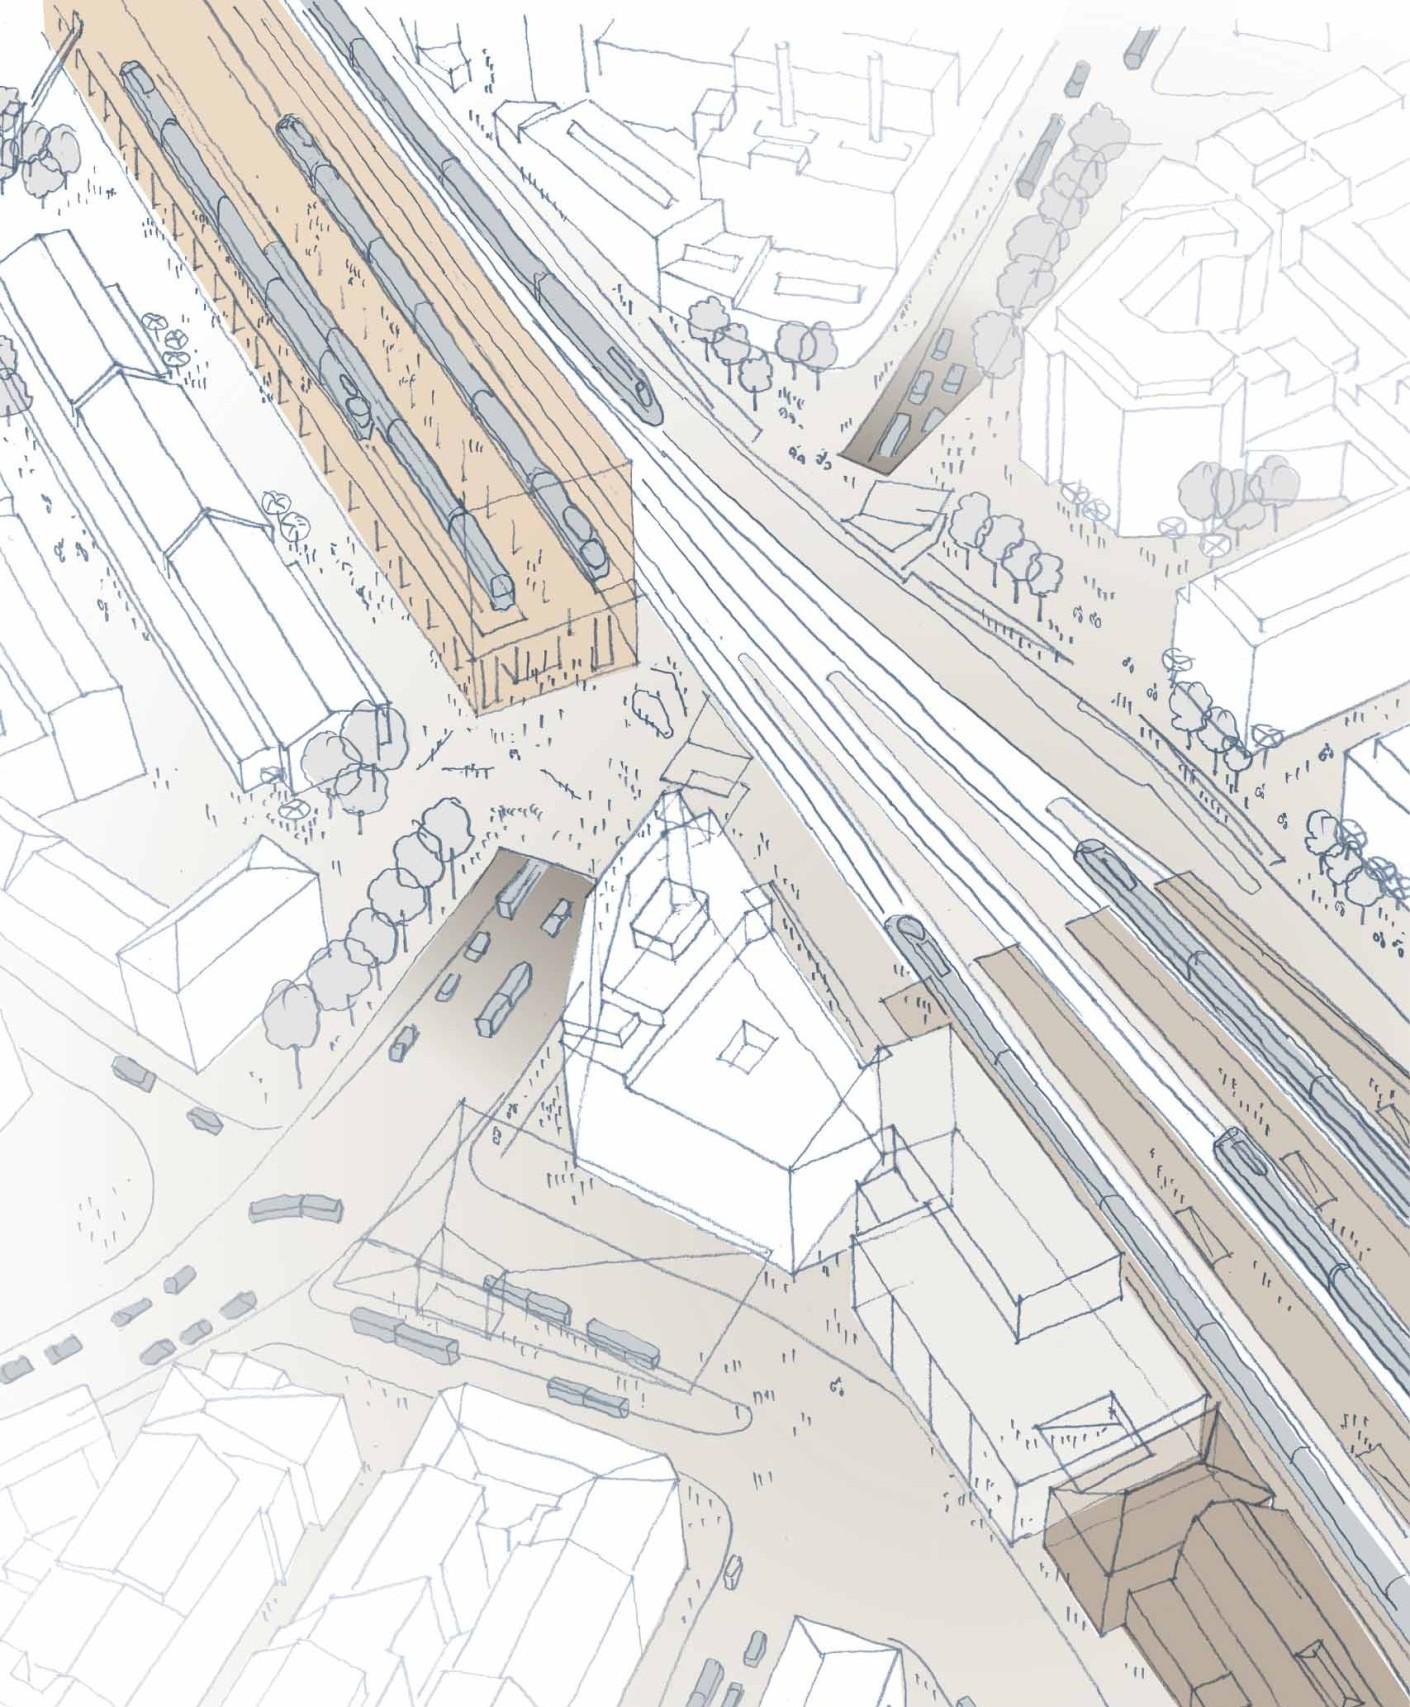 Skizze Ausbau Bahnhof Winterthur Südosten